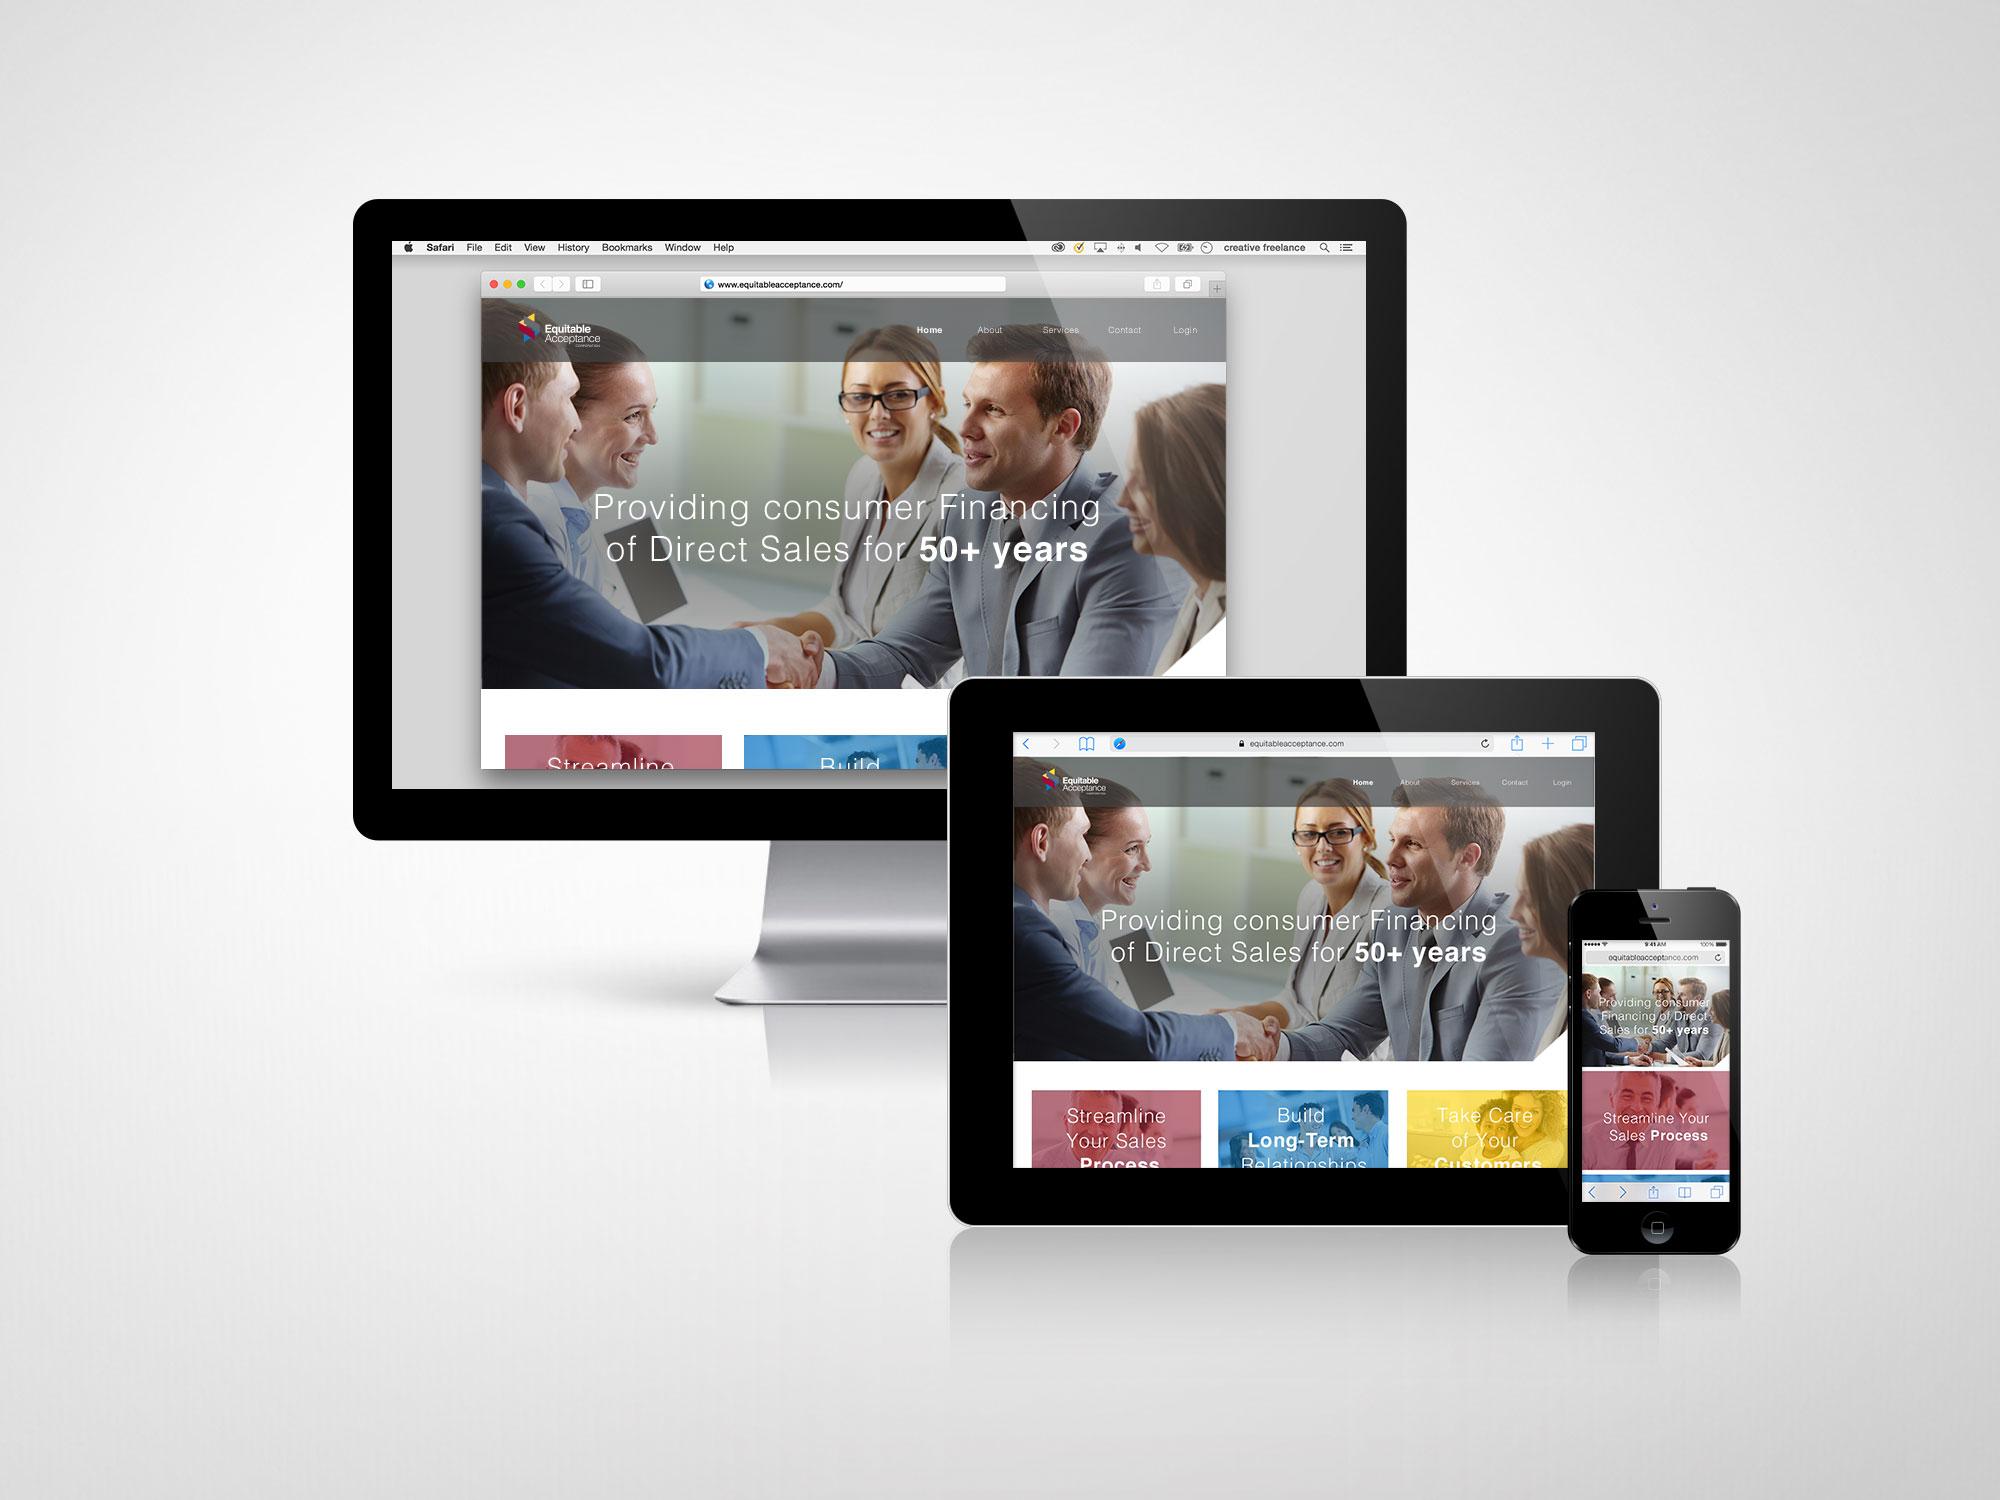 creativemccoy-design-equitableacceptance-branding-7.jpg